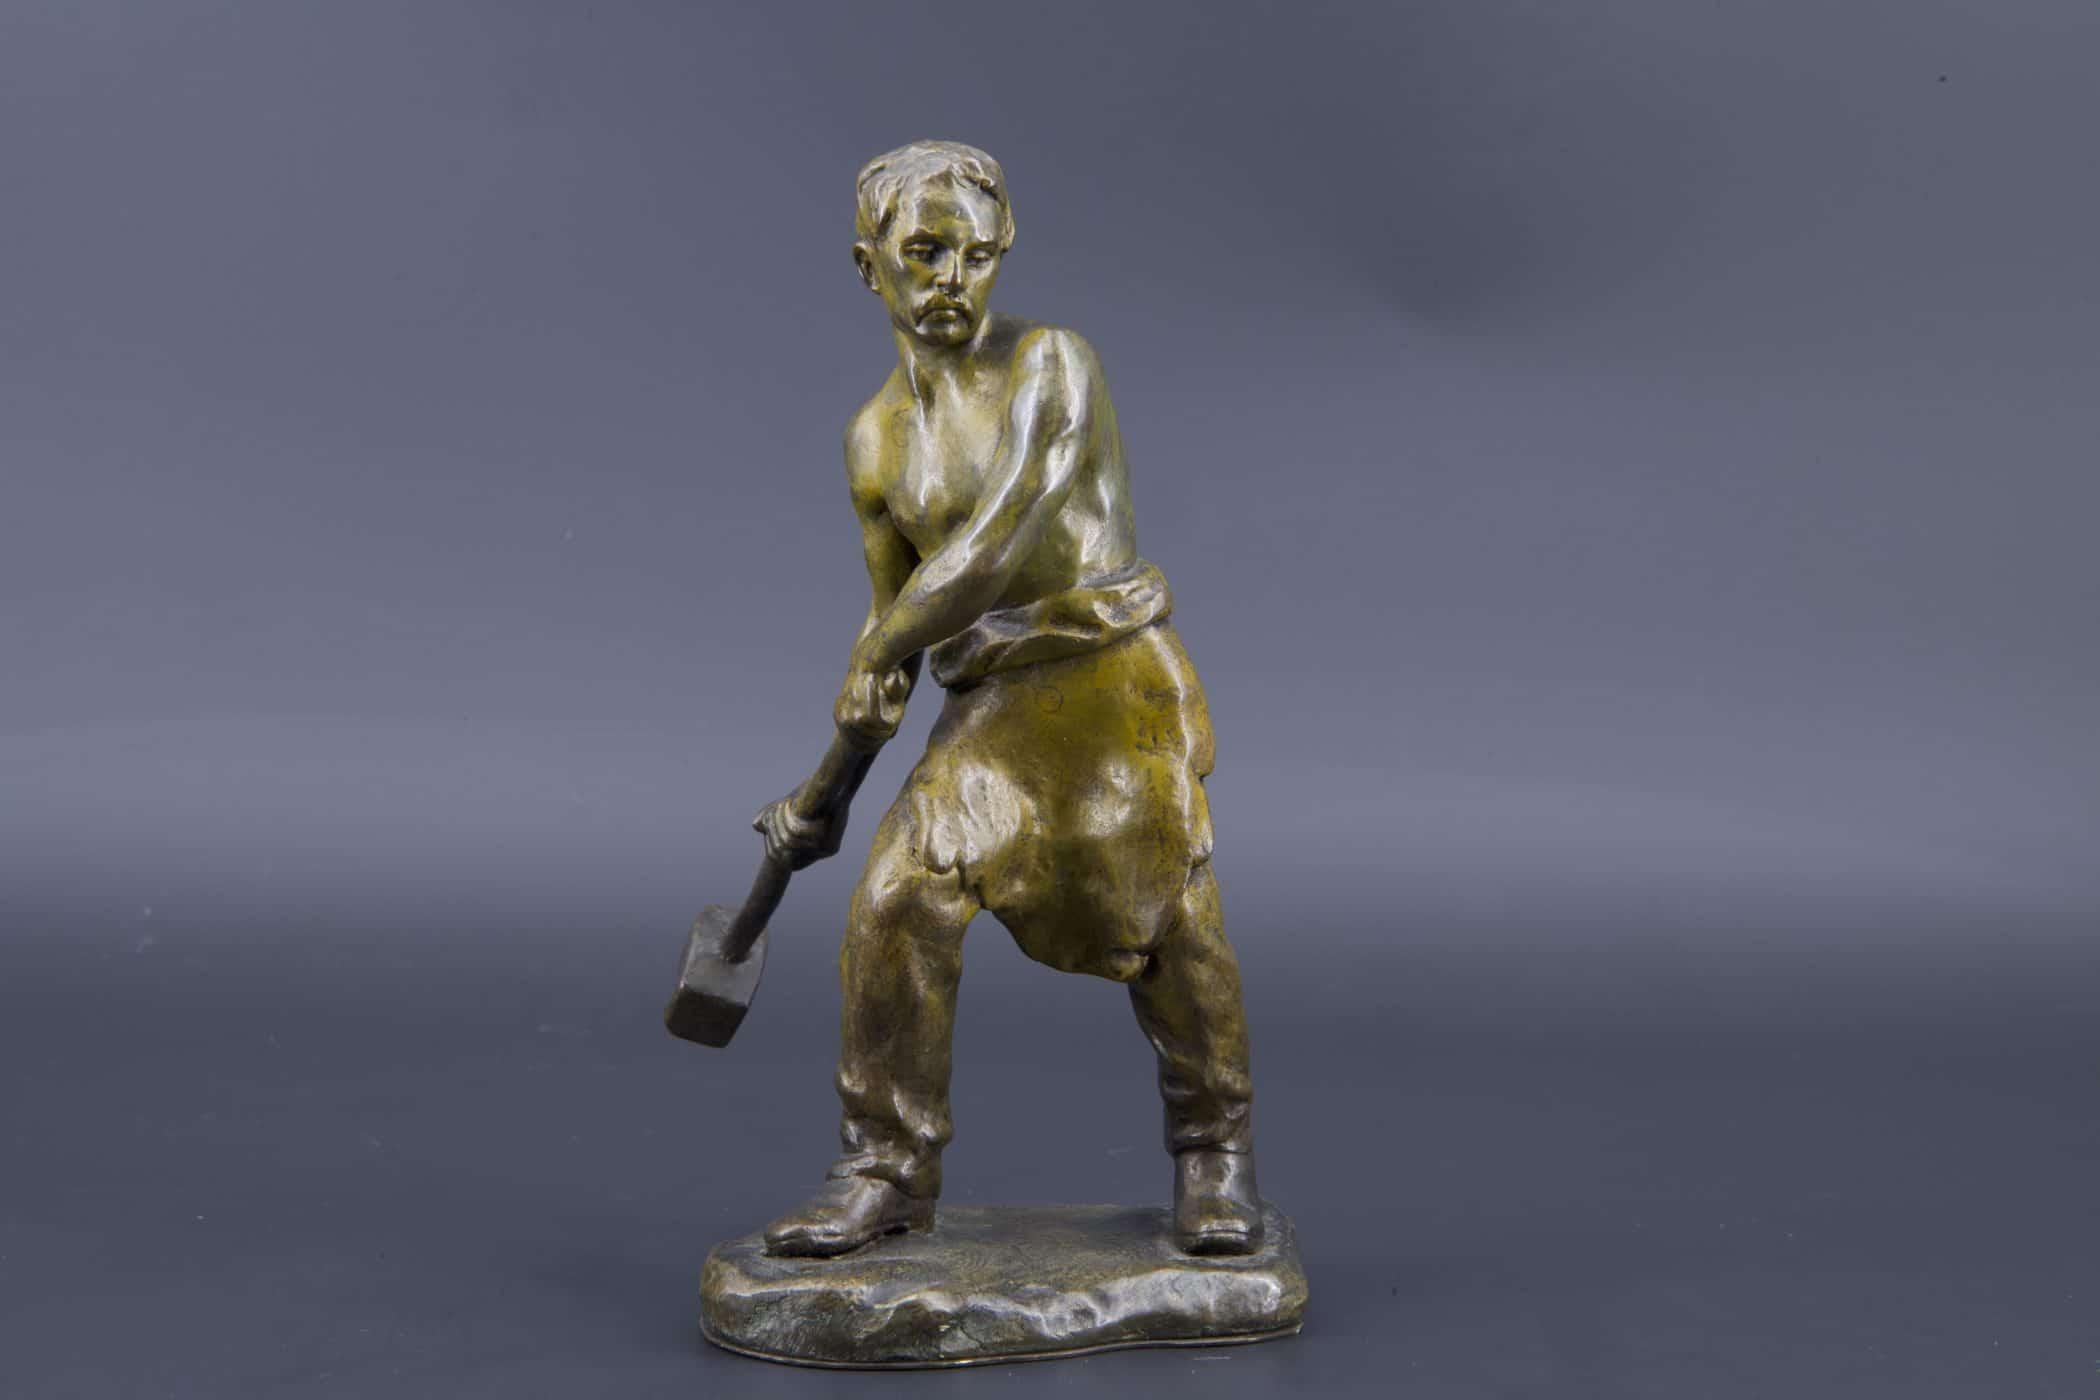 Bronze du sculpteur hongrois Andor Ruff, XXe siècle